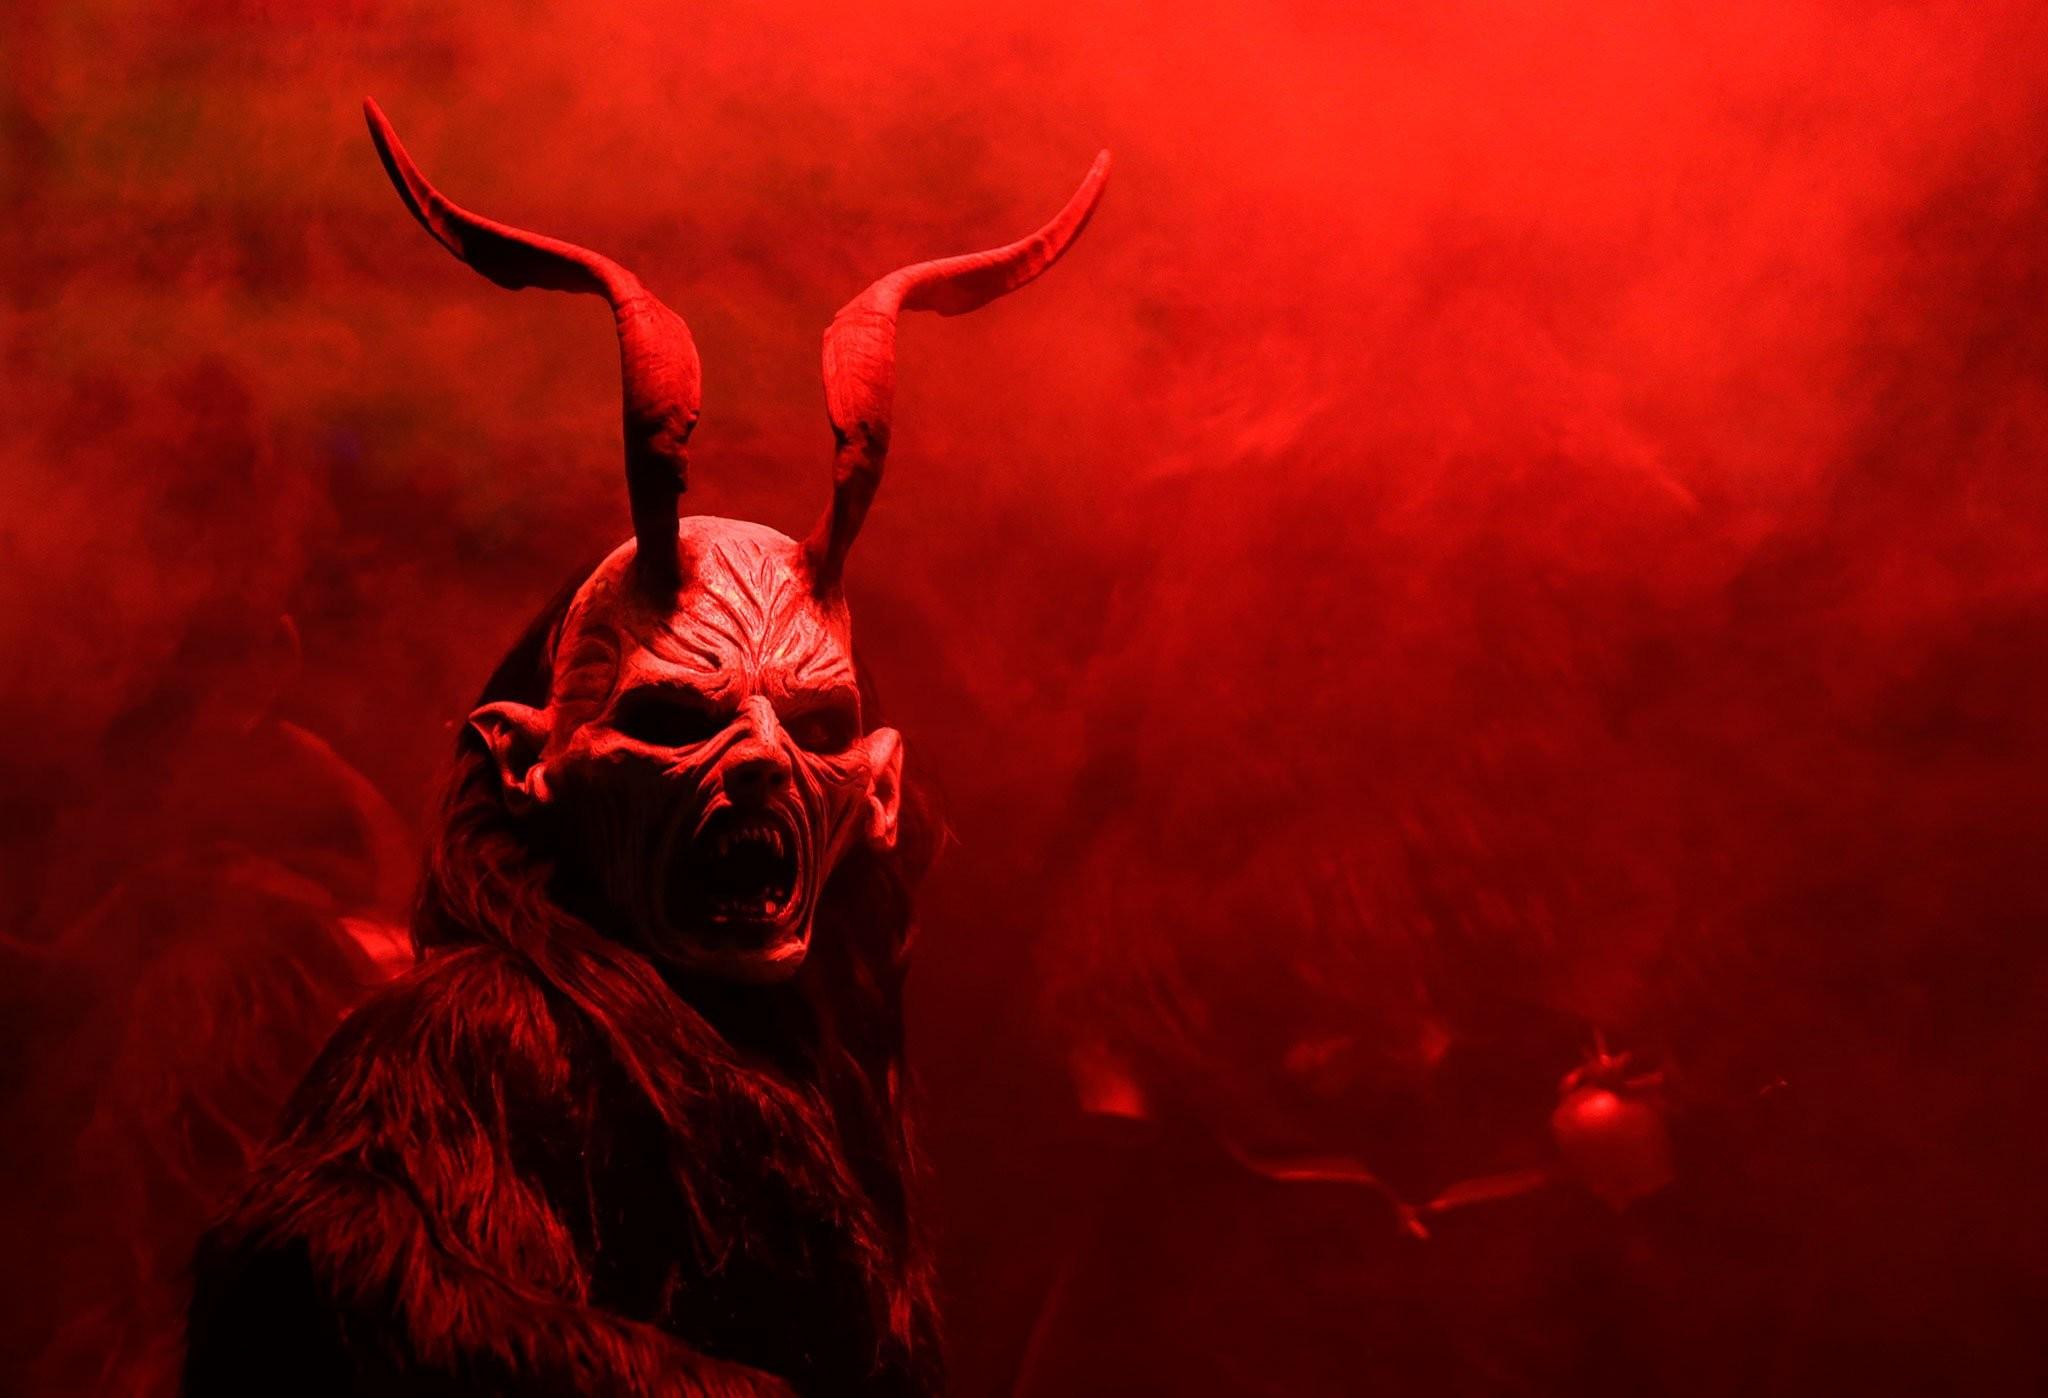 Res: 2048x1398, storyr, demon, evil backgrounds, artwork, christmas, horror, occult,  dark,krampus, high resolution,download, monster, hd art wallpapers Wallpaper  HD